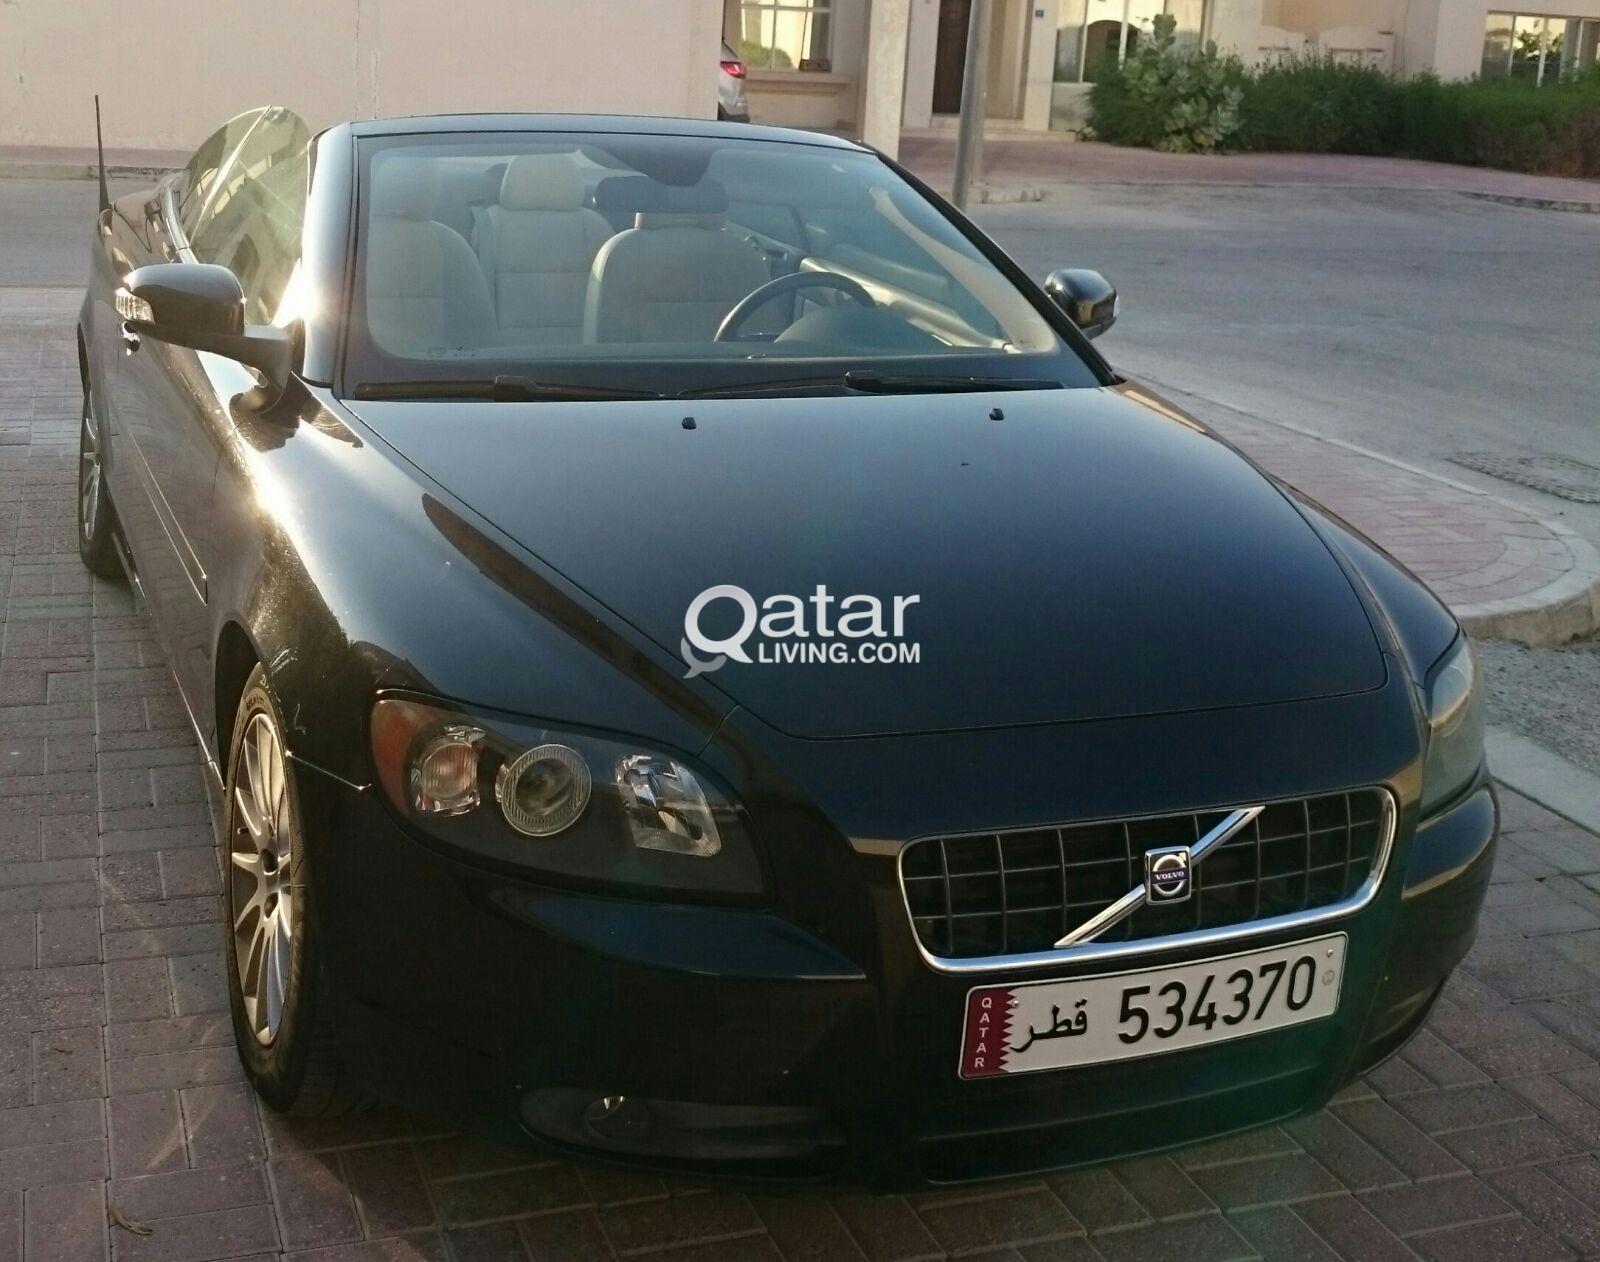 Volvo C70 Convertible Qatar Living